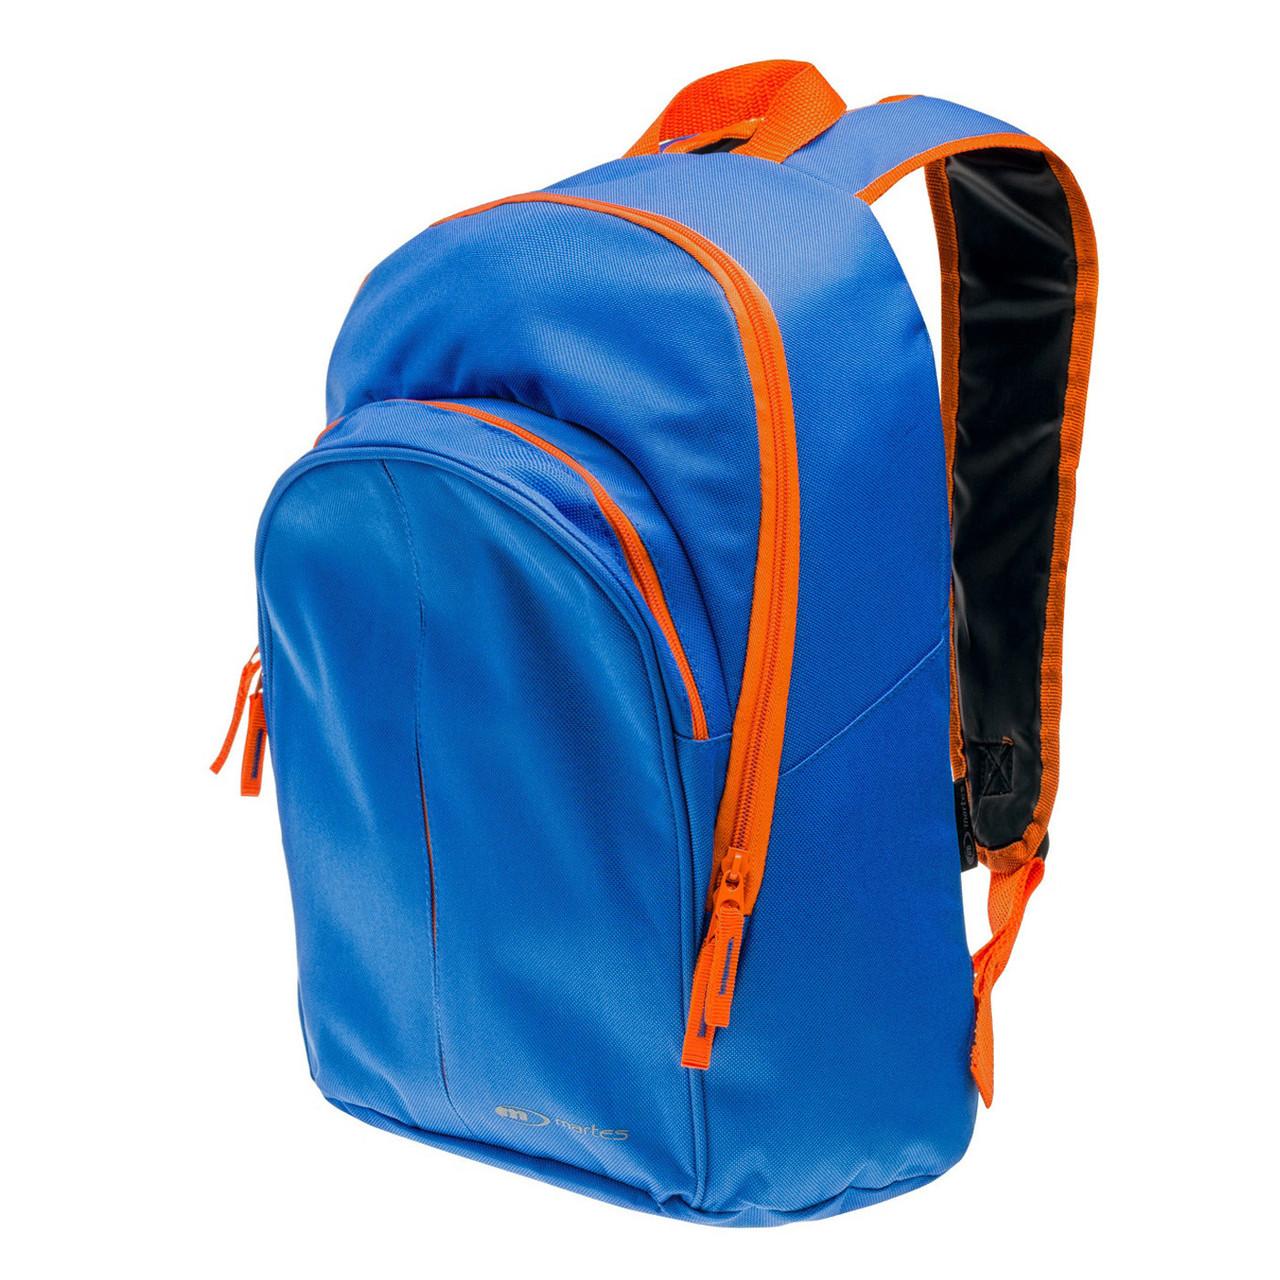 Рюкзак Martes Virno II Blue-Orange